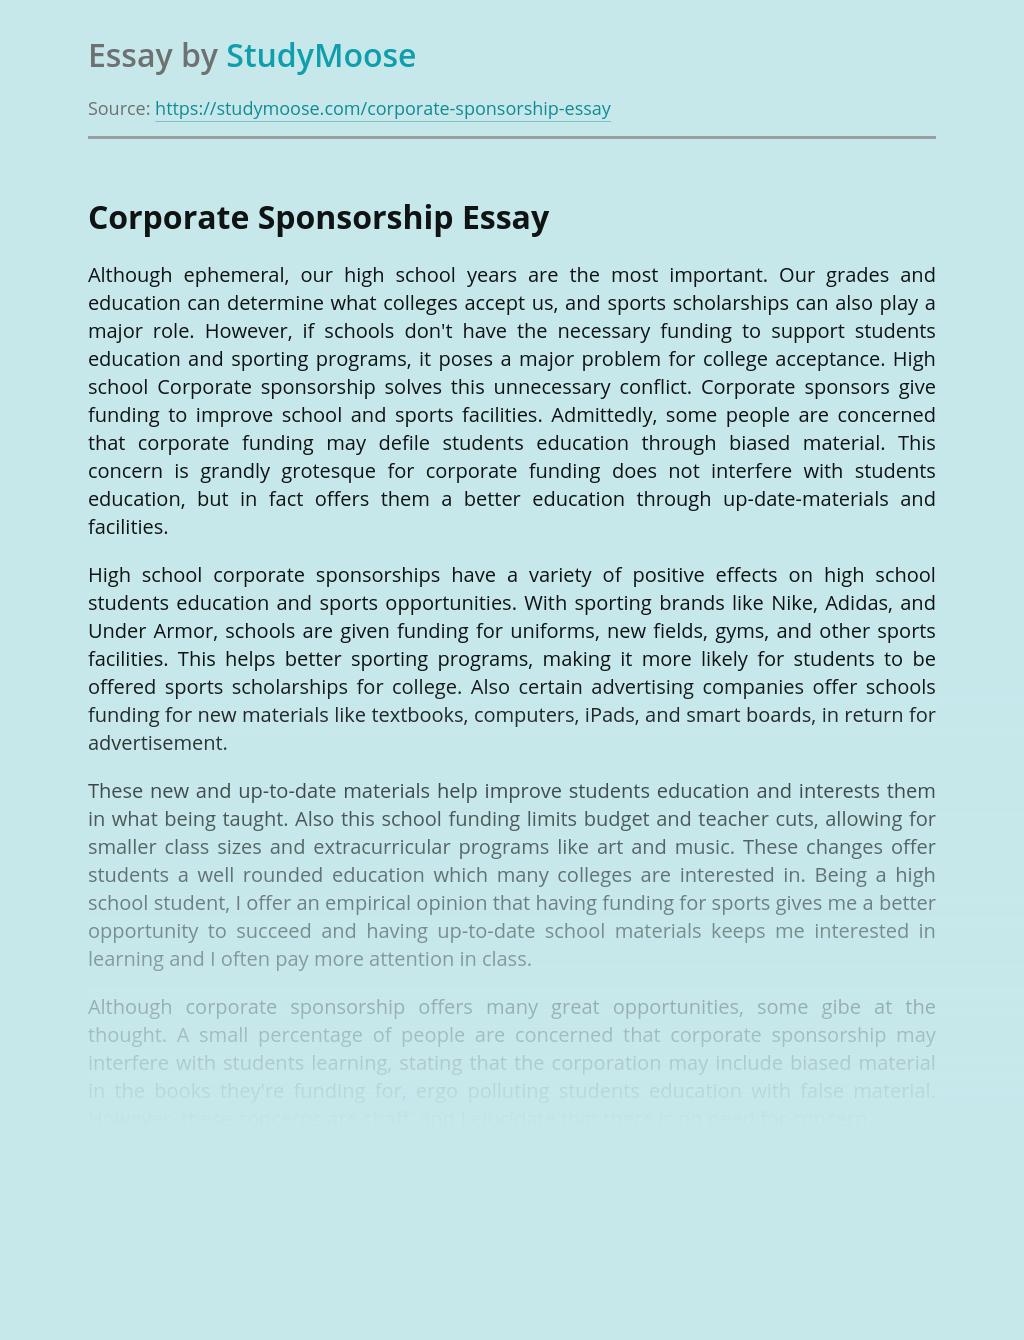 Corporate Sponsorship in Education